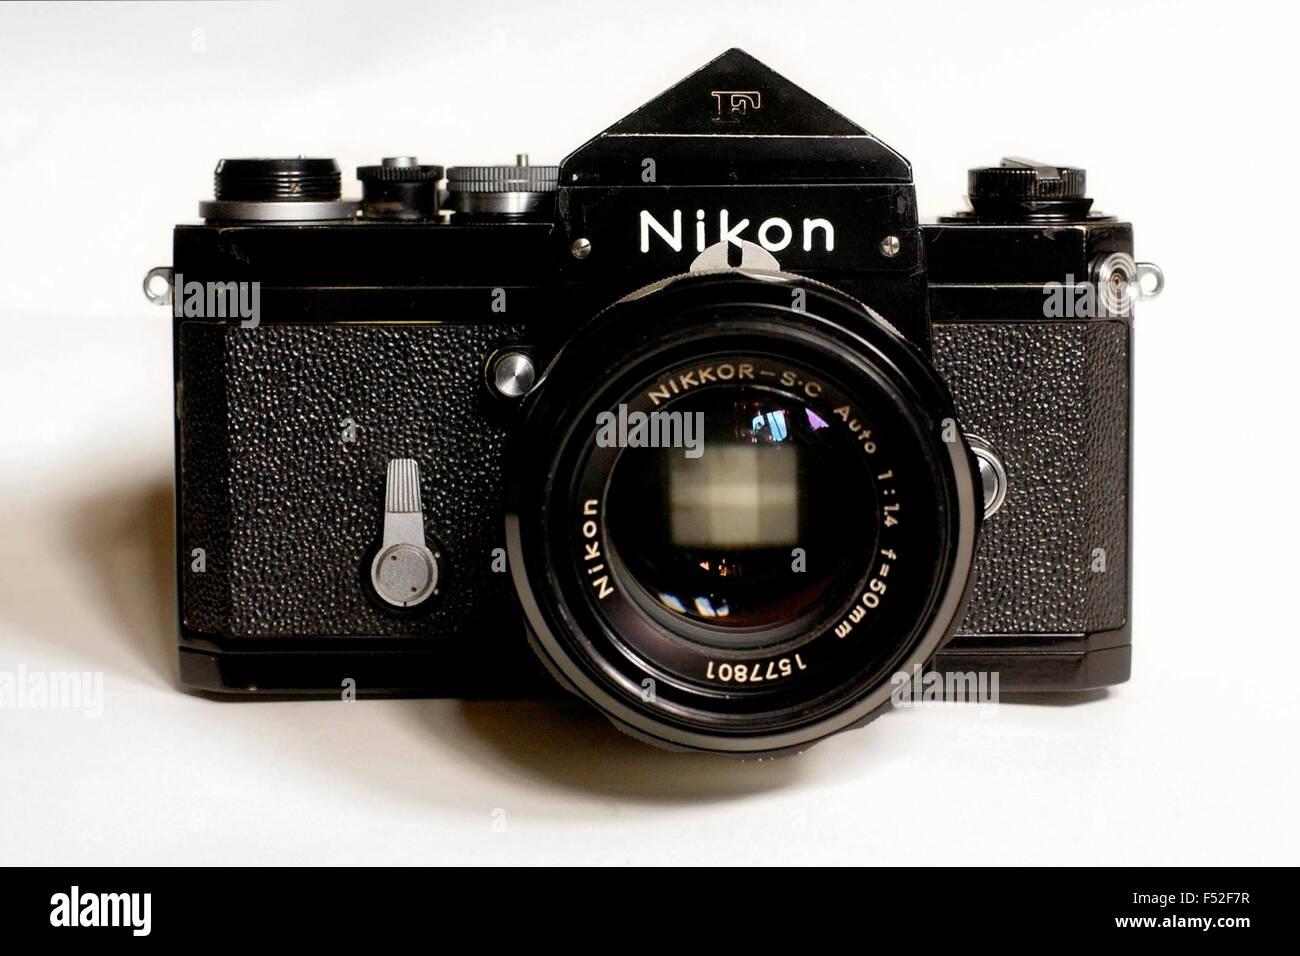 AJAXNETPHOTO. PHOTOGRAPHIC ICON - THE FAMED NIKON F 35MM SINGLE LENS REFLEX CAMERA LAUNCHED BY NIPPON KOGAKU TOKYO - Stock Image